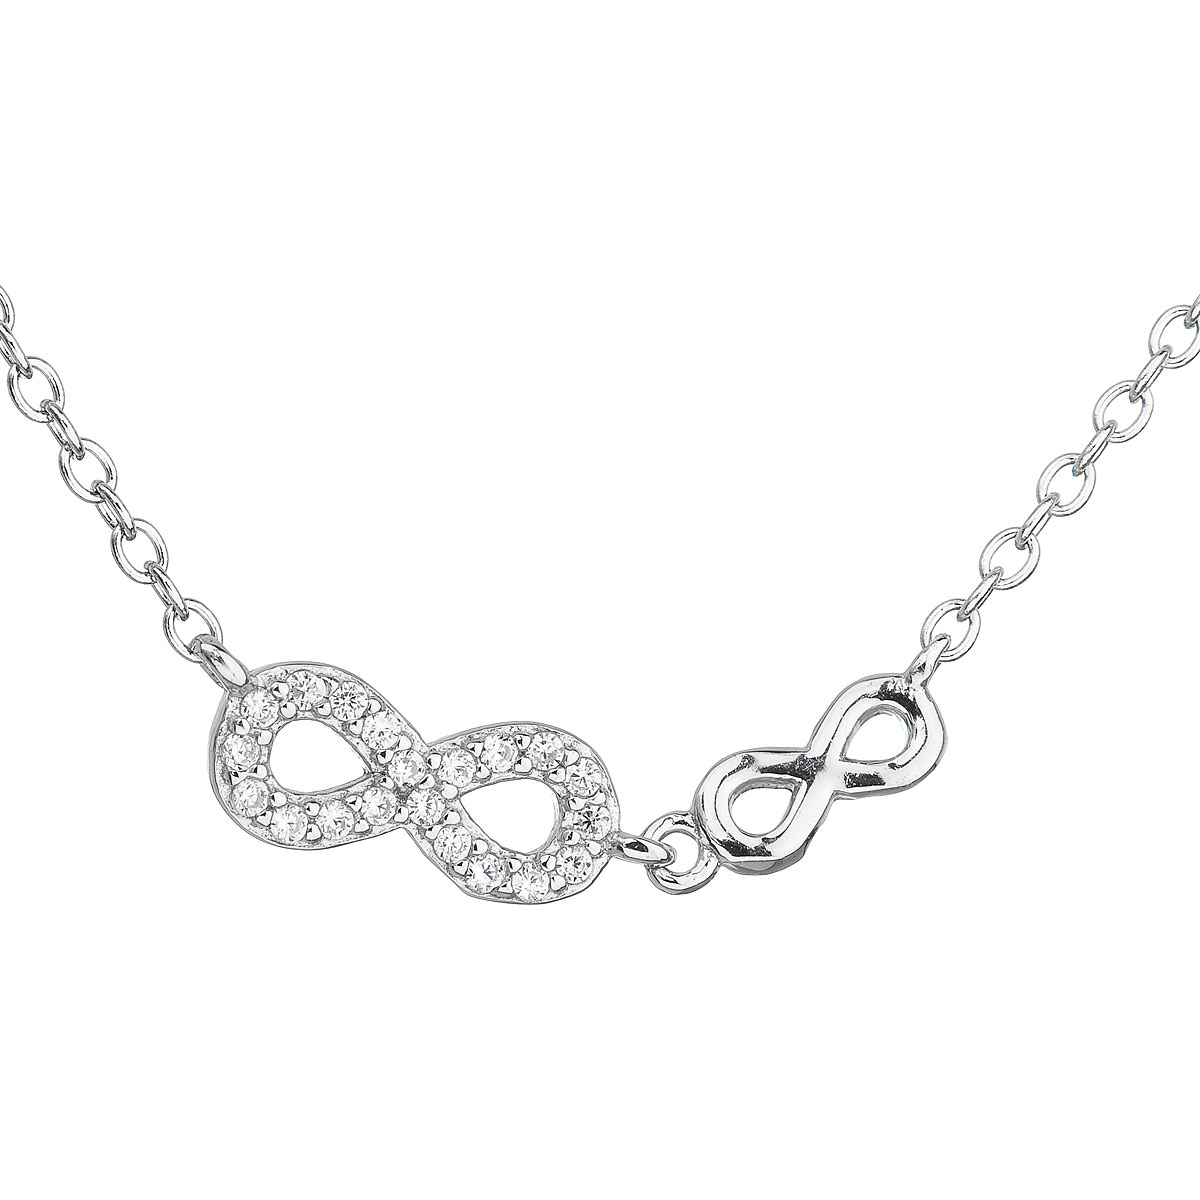 Strieborný náhrdelník so zirkónom biele nekonečno 12041.1